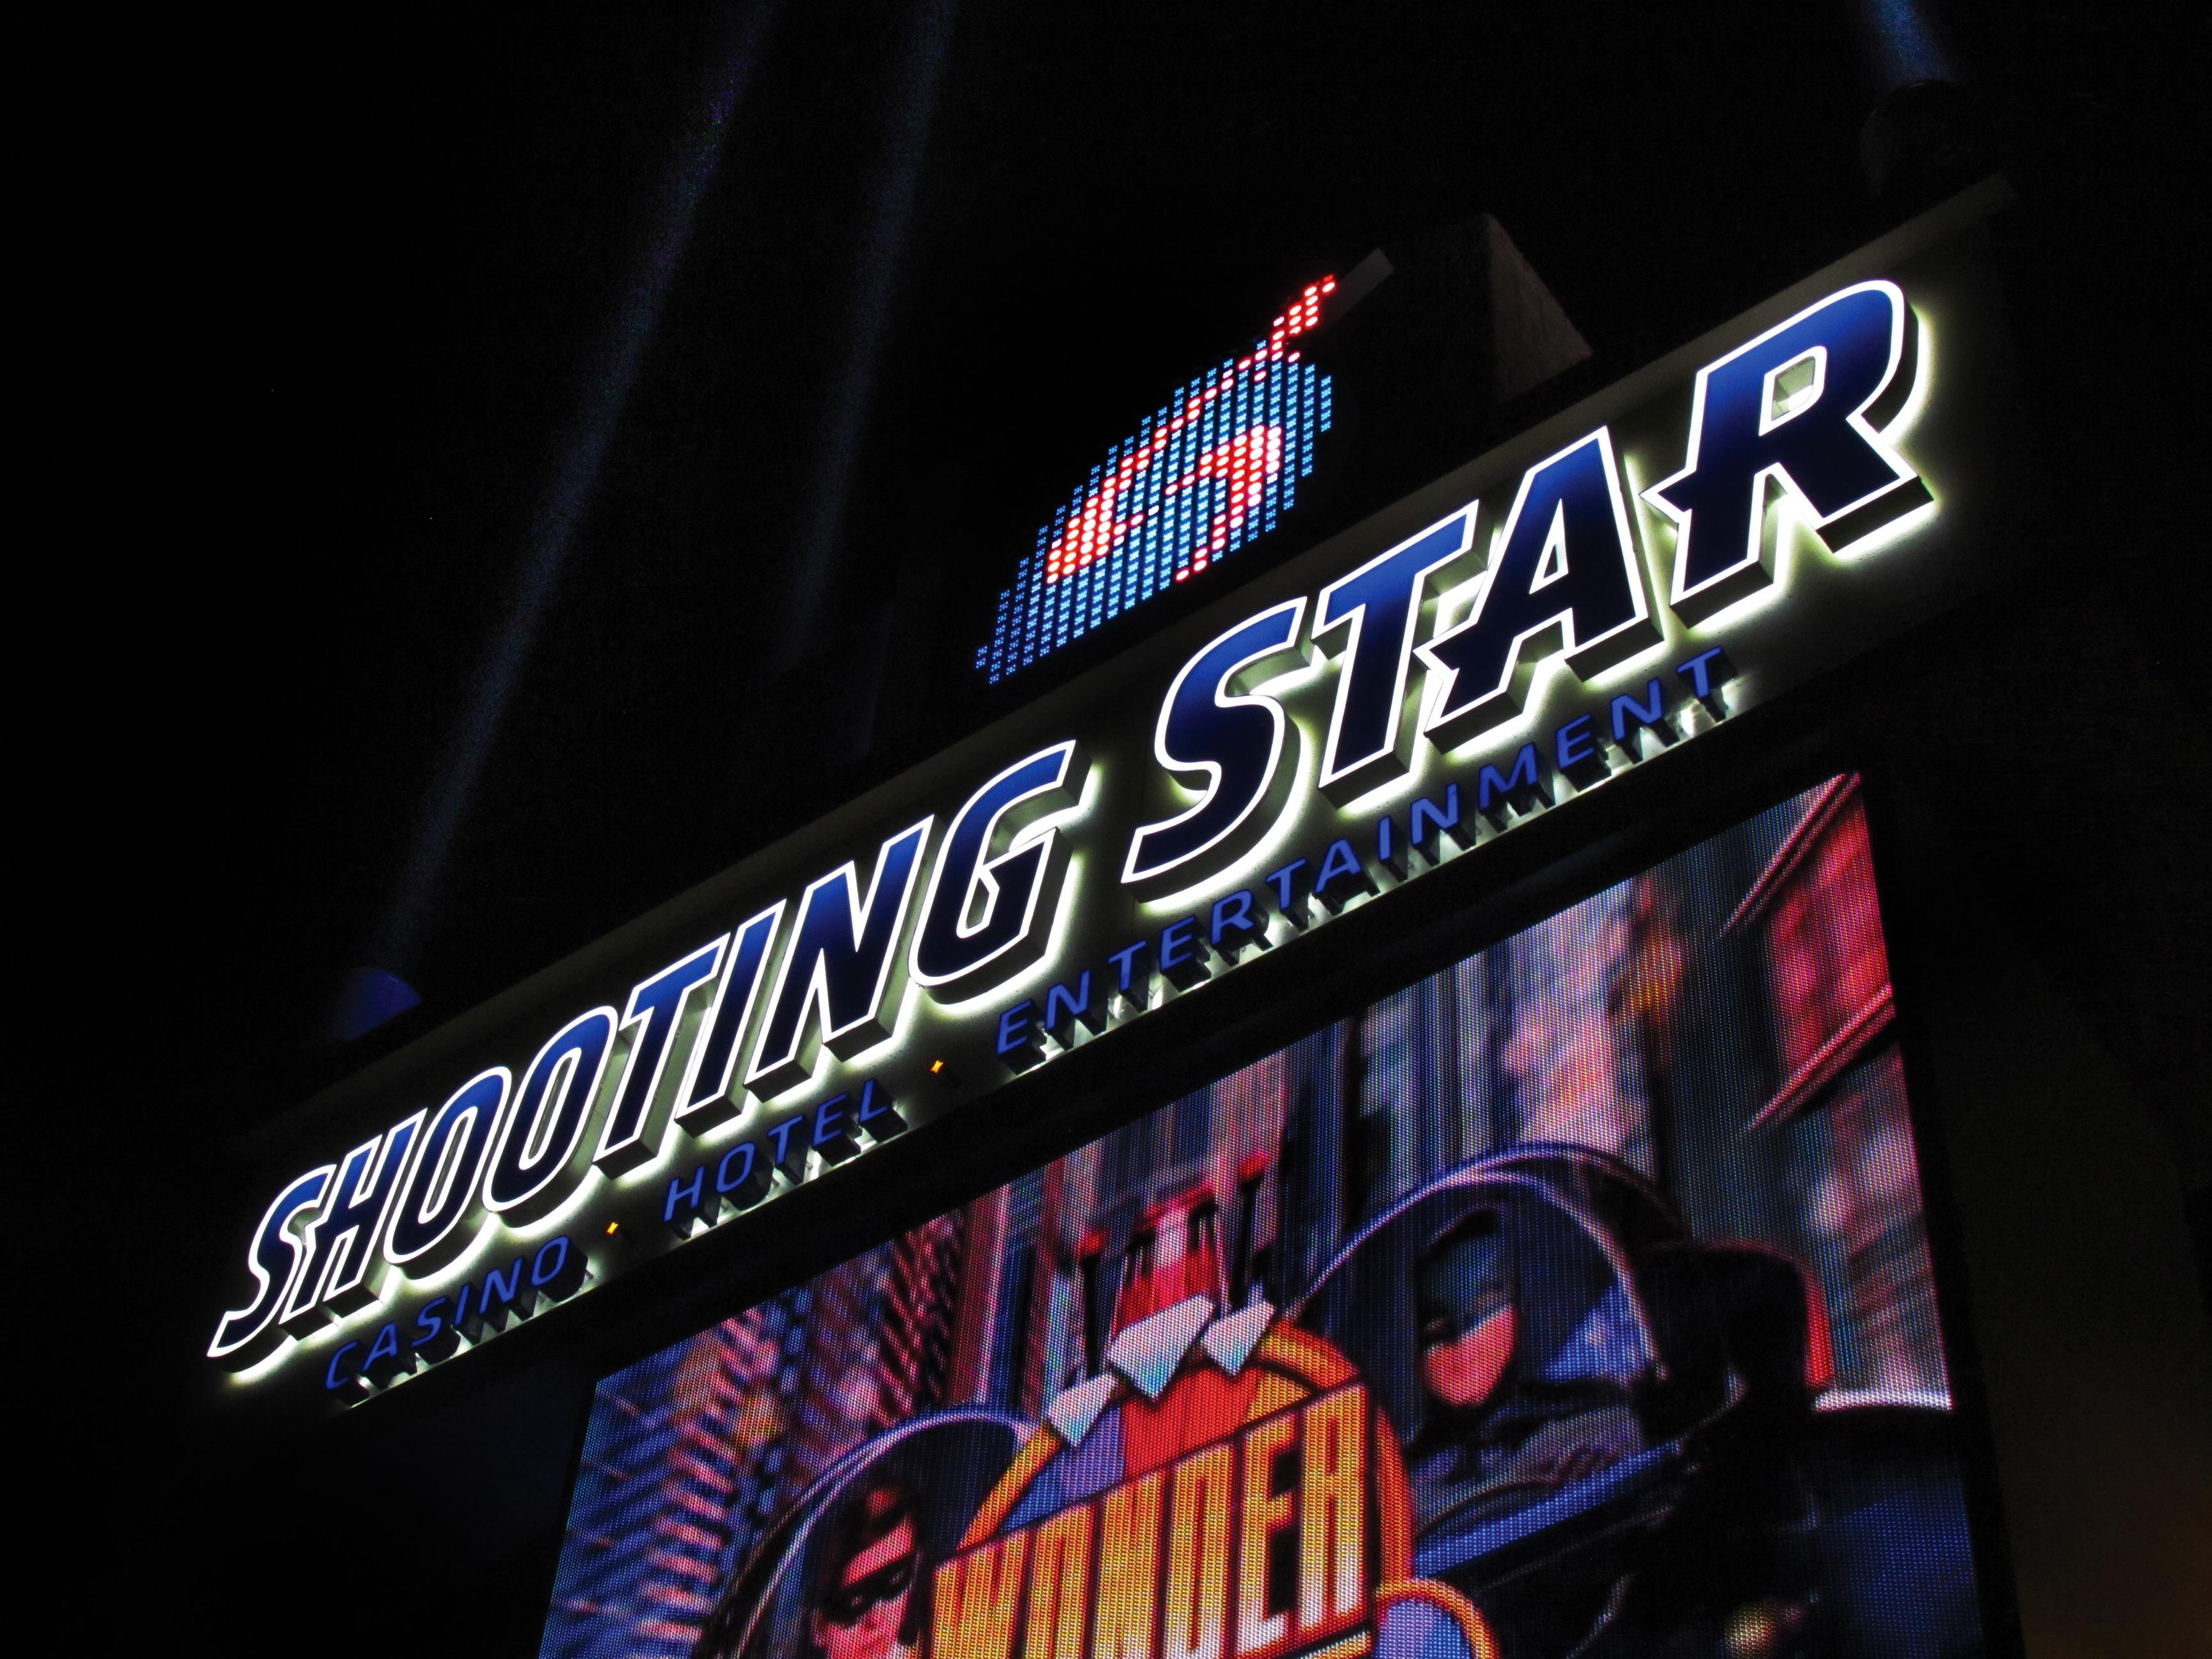 Exterior of Shooting Star Casino